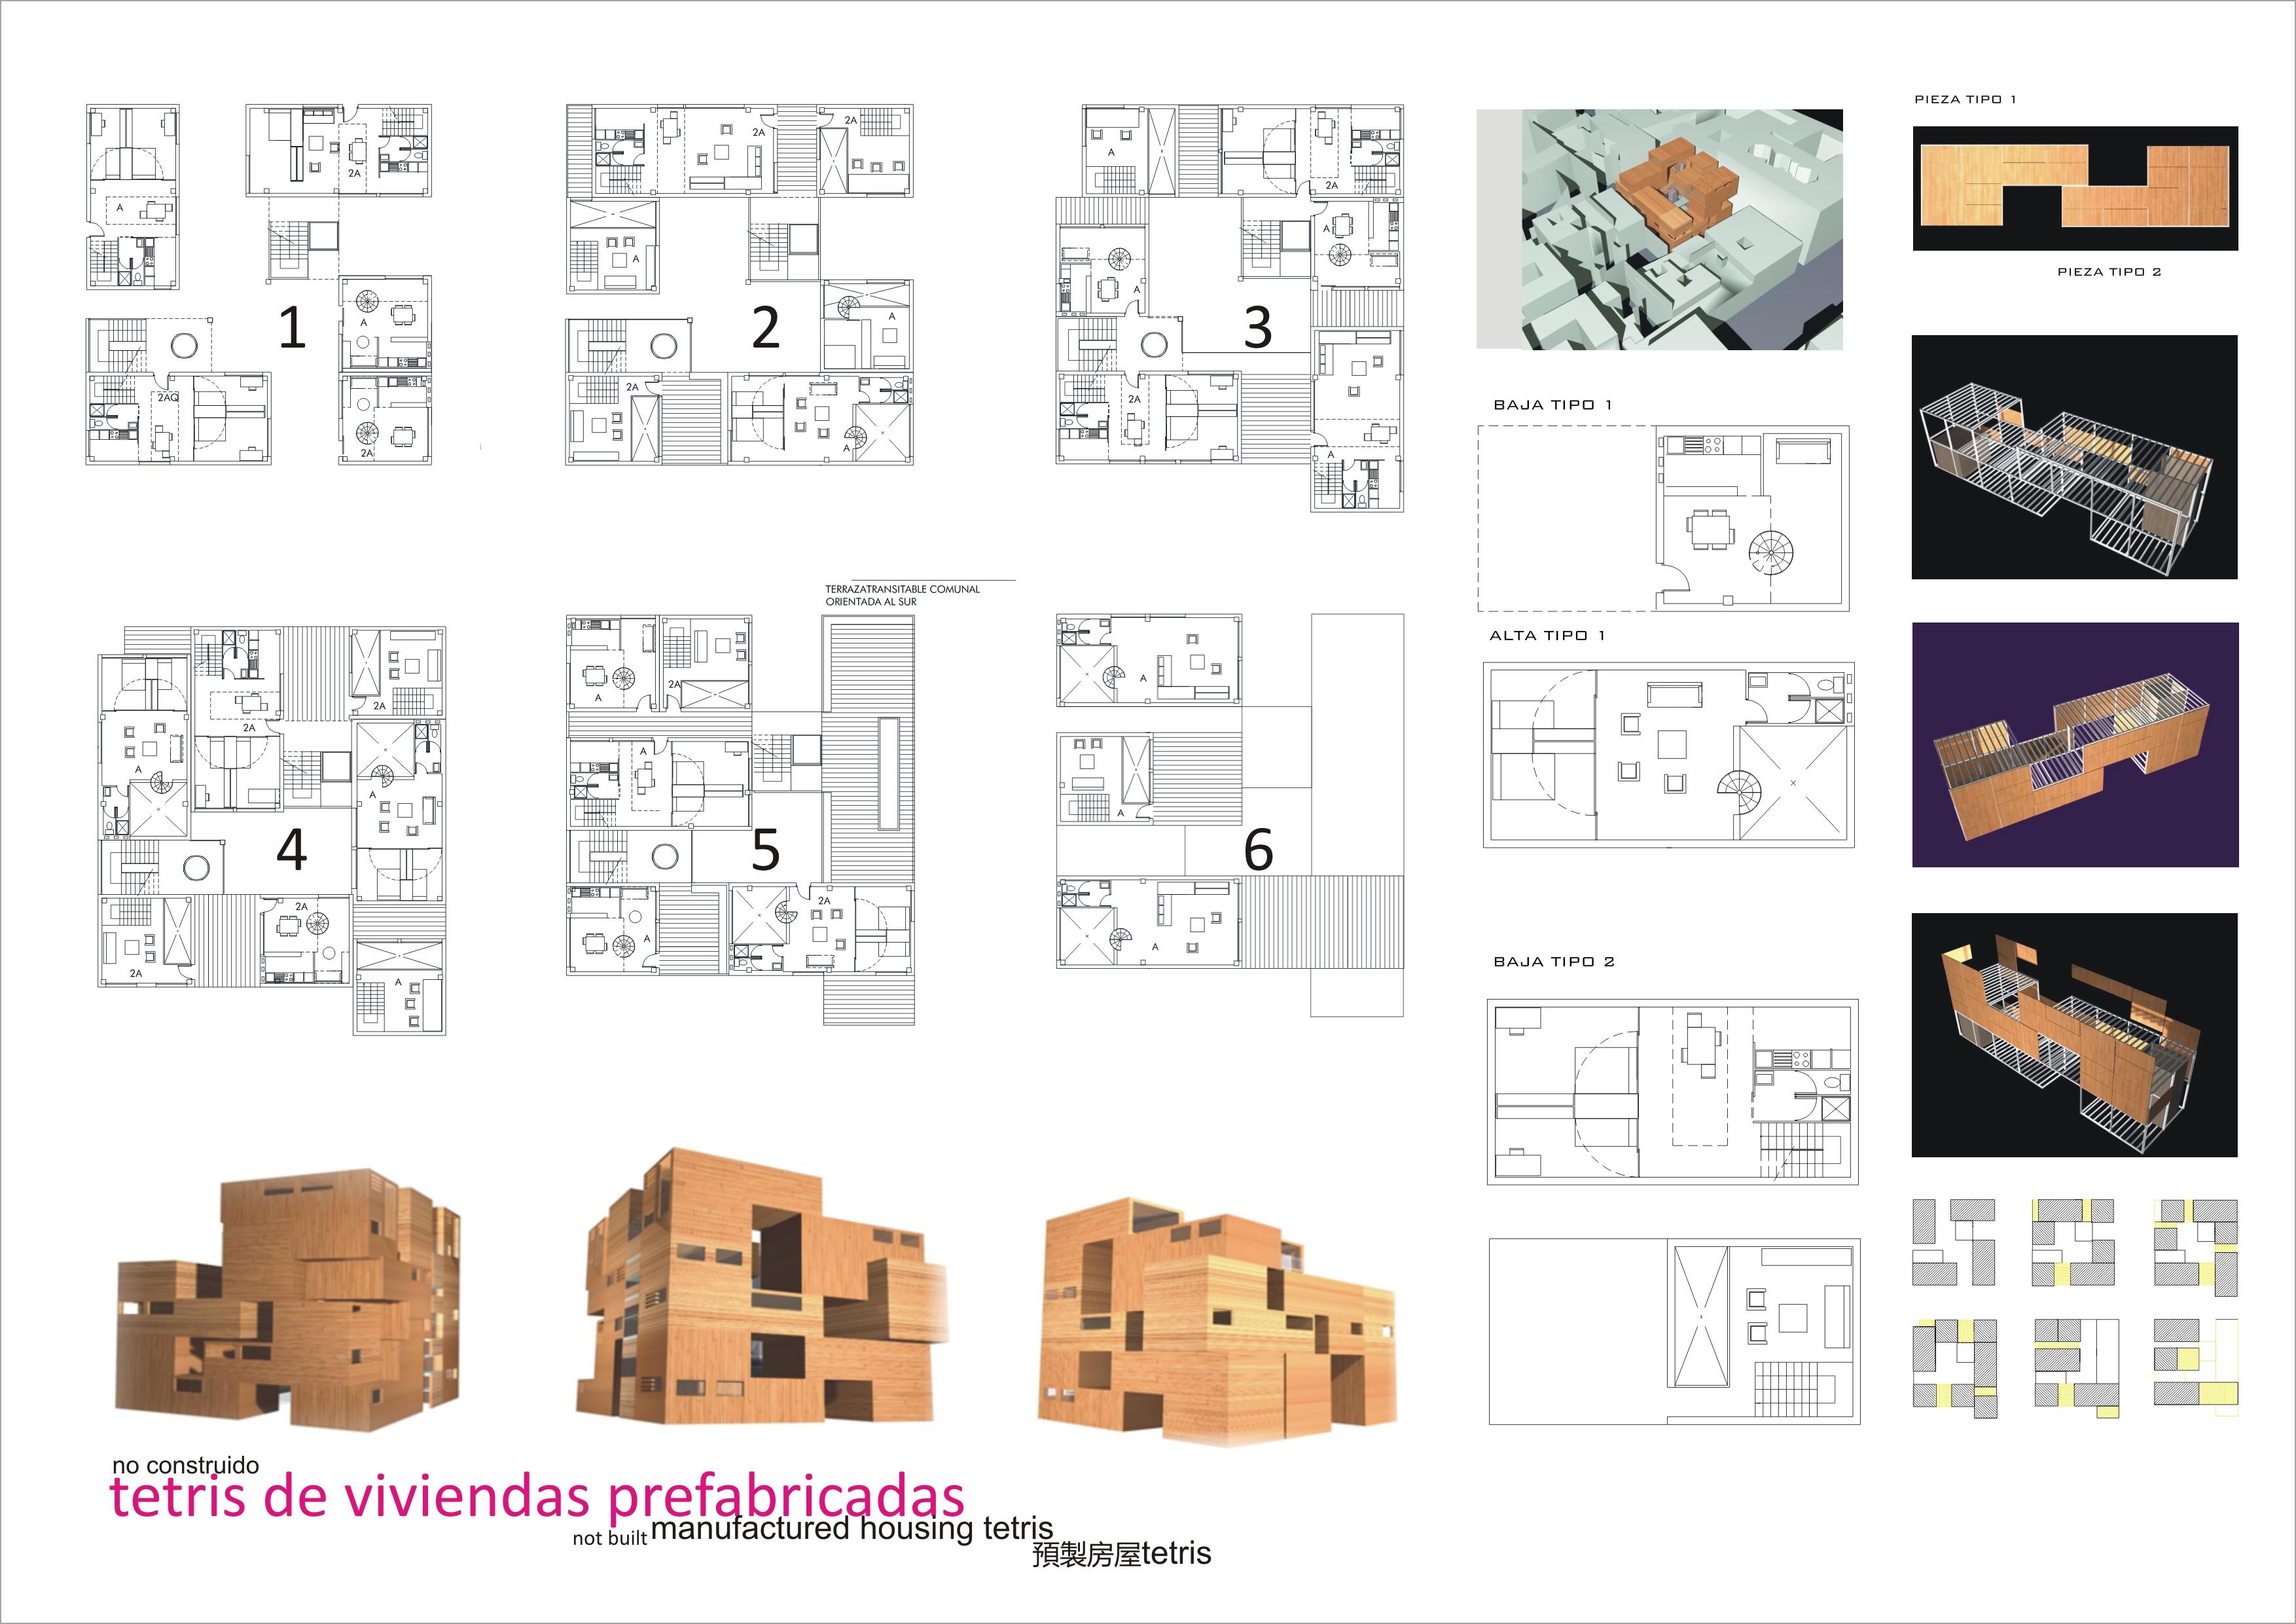 Laberinto de viviendas prefabricadas en centro de granada - Casas prefabricadas en granada ...